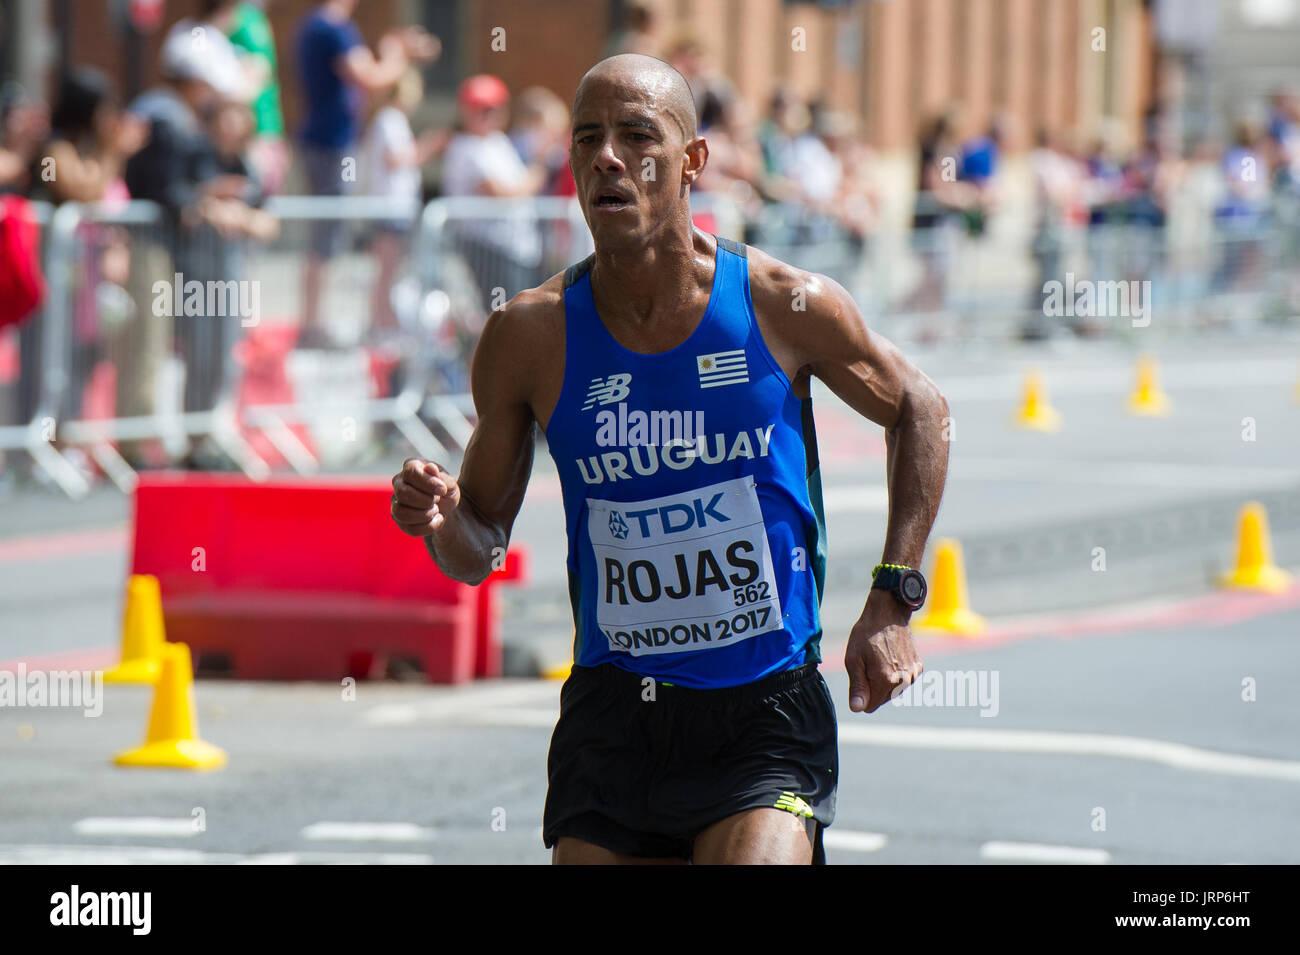 London, UK. 6th August, 2017. Aguelmis Rojas (Uruguay) at the IAAF World Athletics Championships Men's Marathon Race Credit: Phil Swallow Photography/Alamy Live News - Stock Image